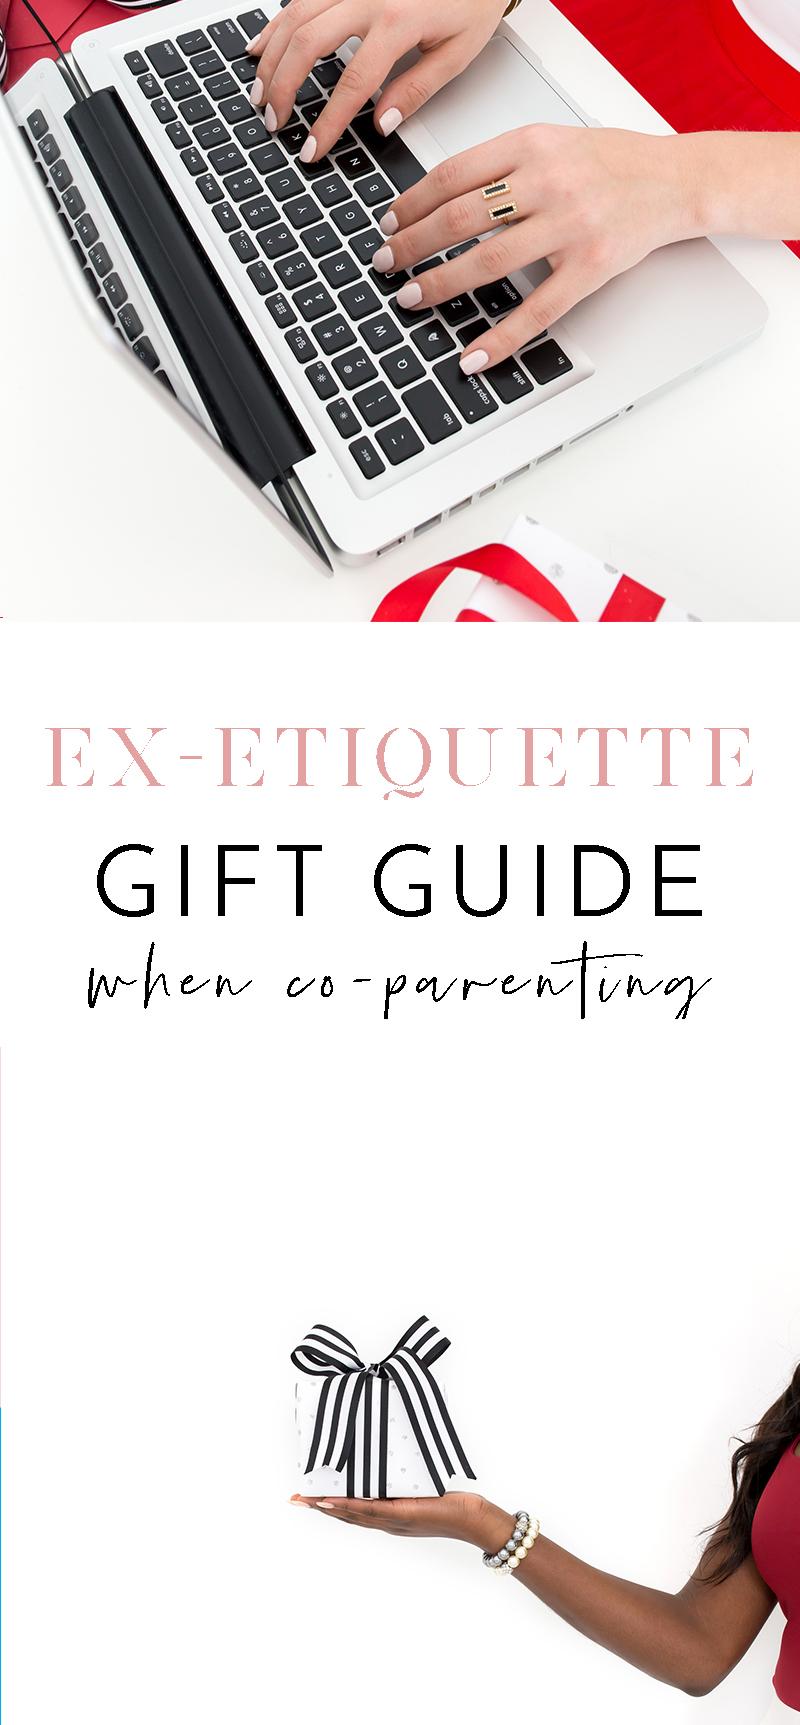 Ex-etiquette Gift Guide When Co-parenting